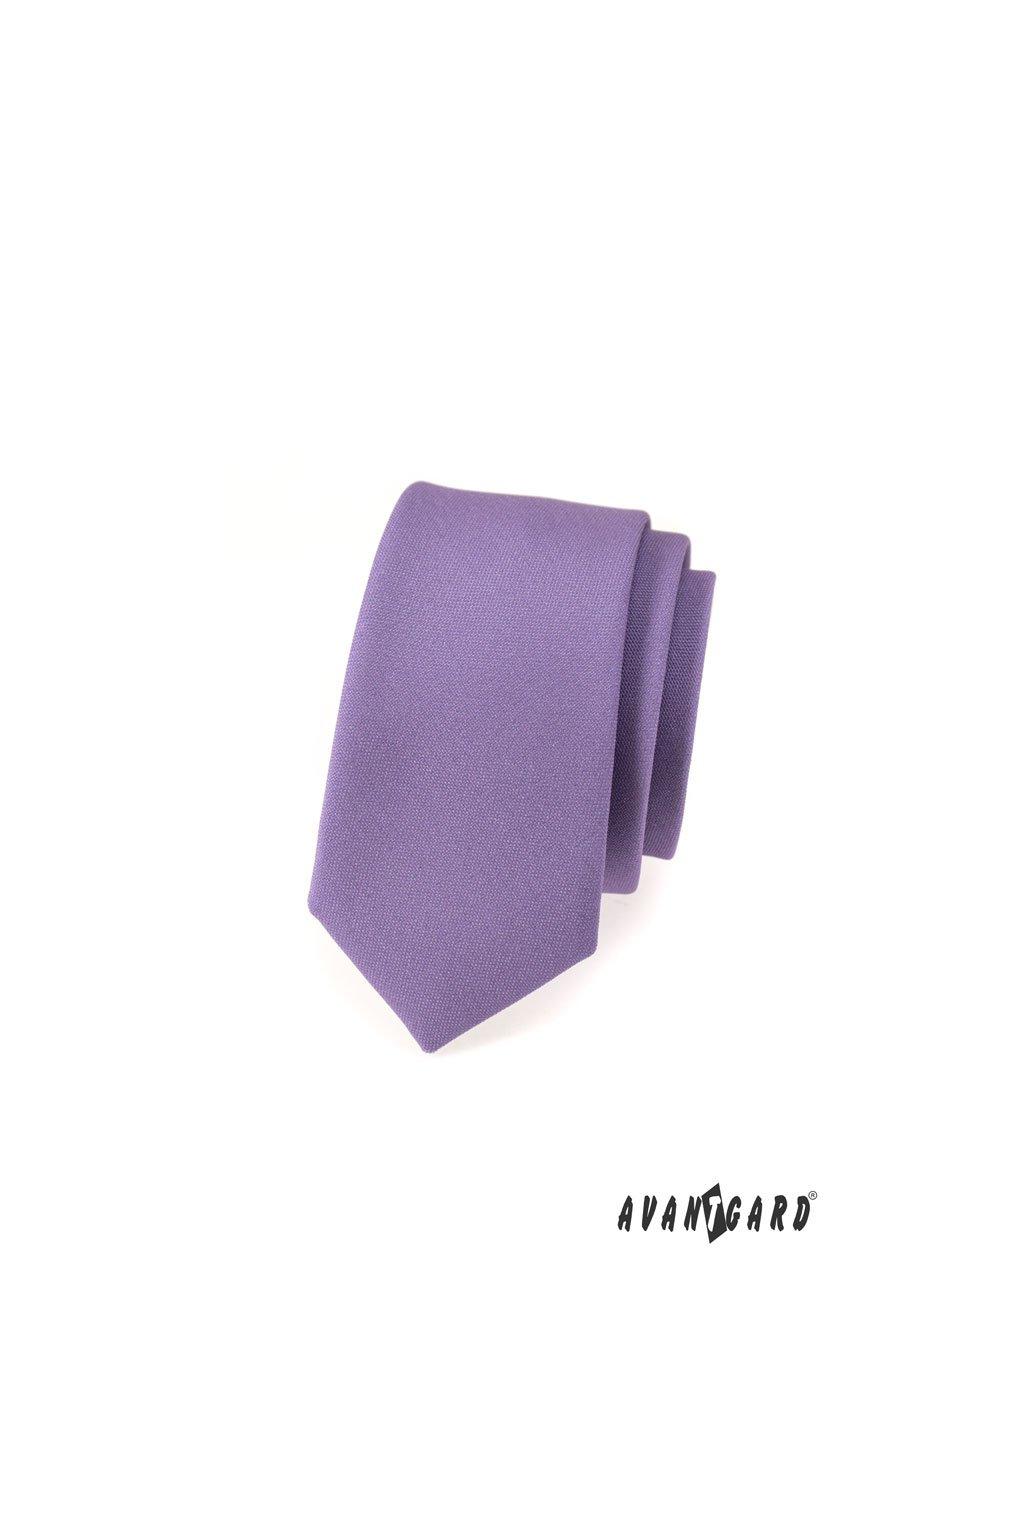 Matná fialová slim kravata